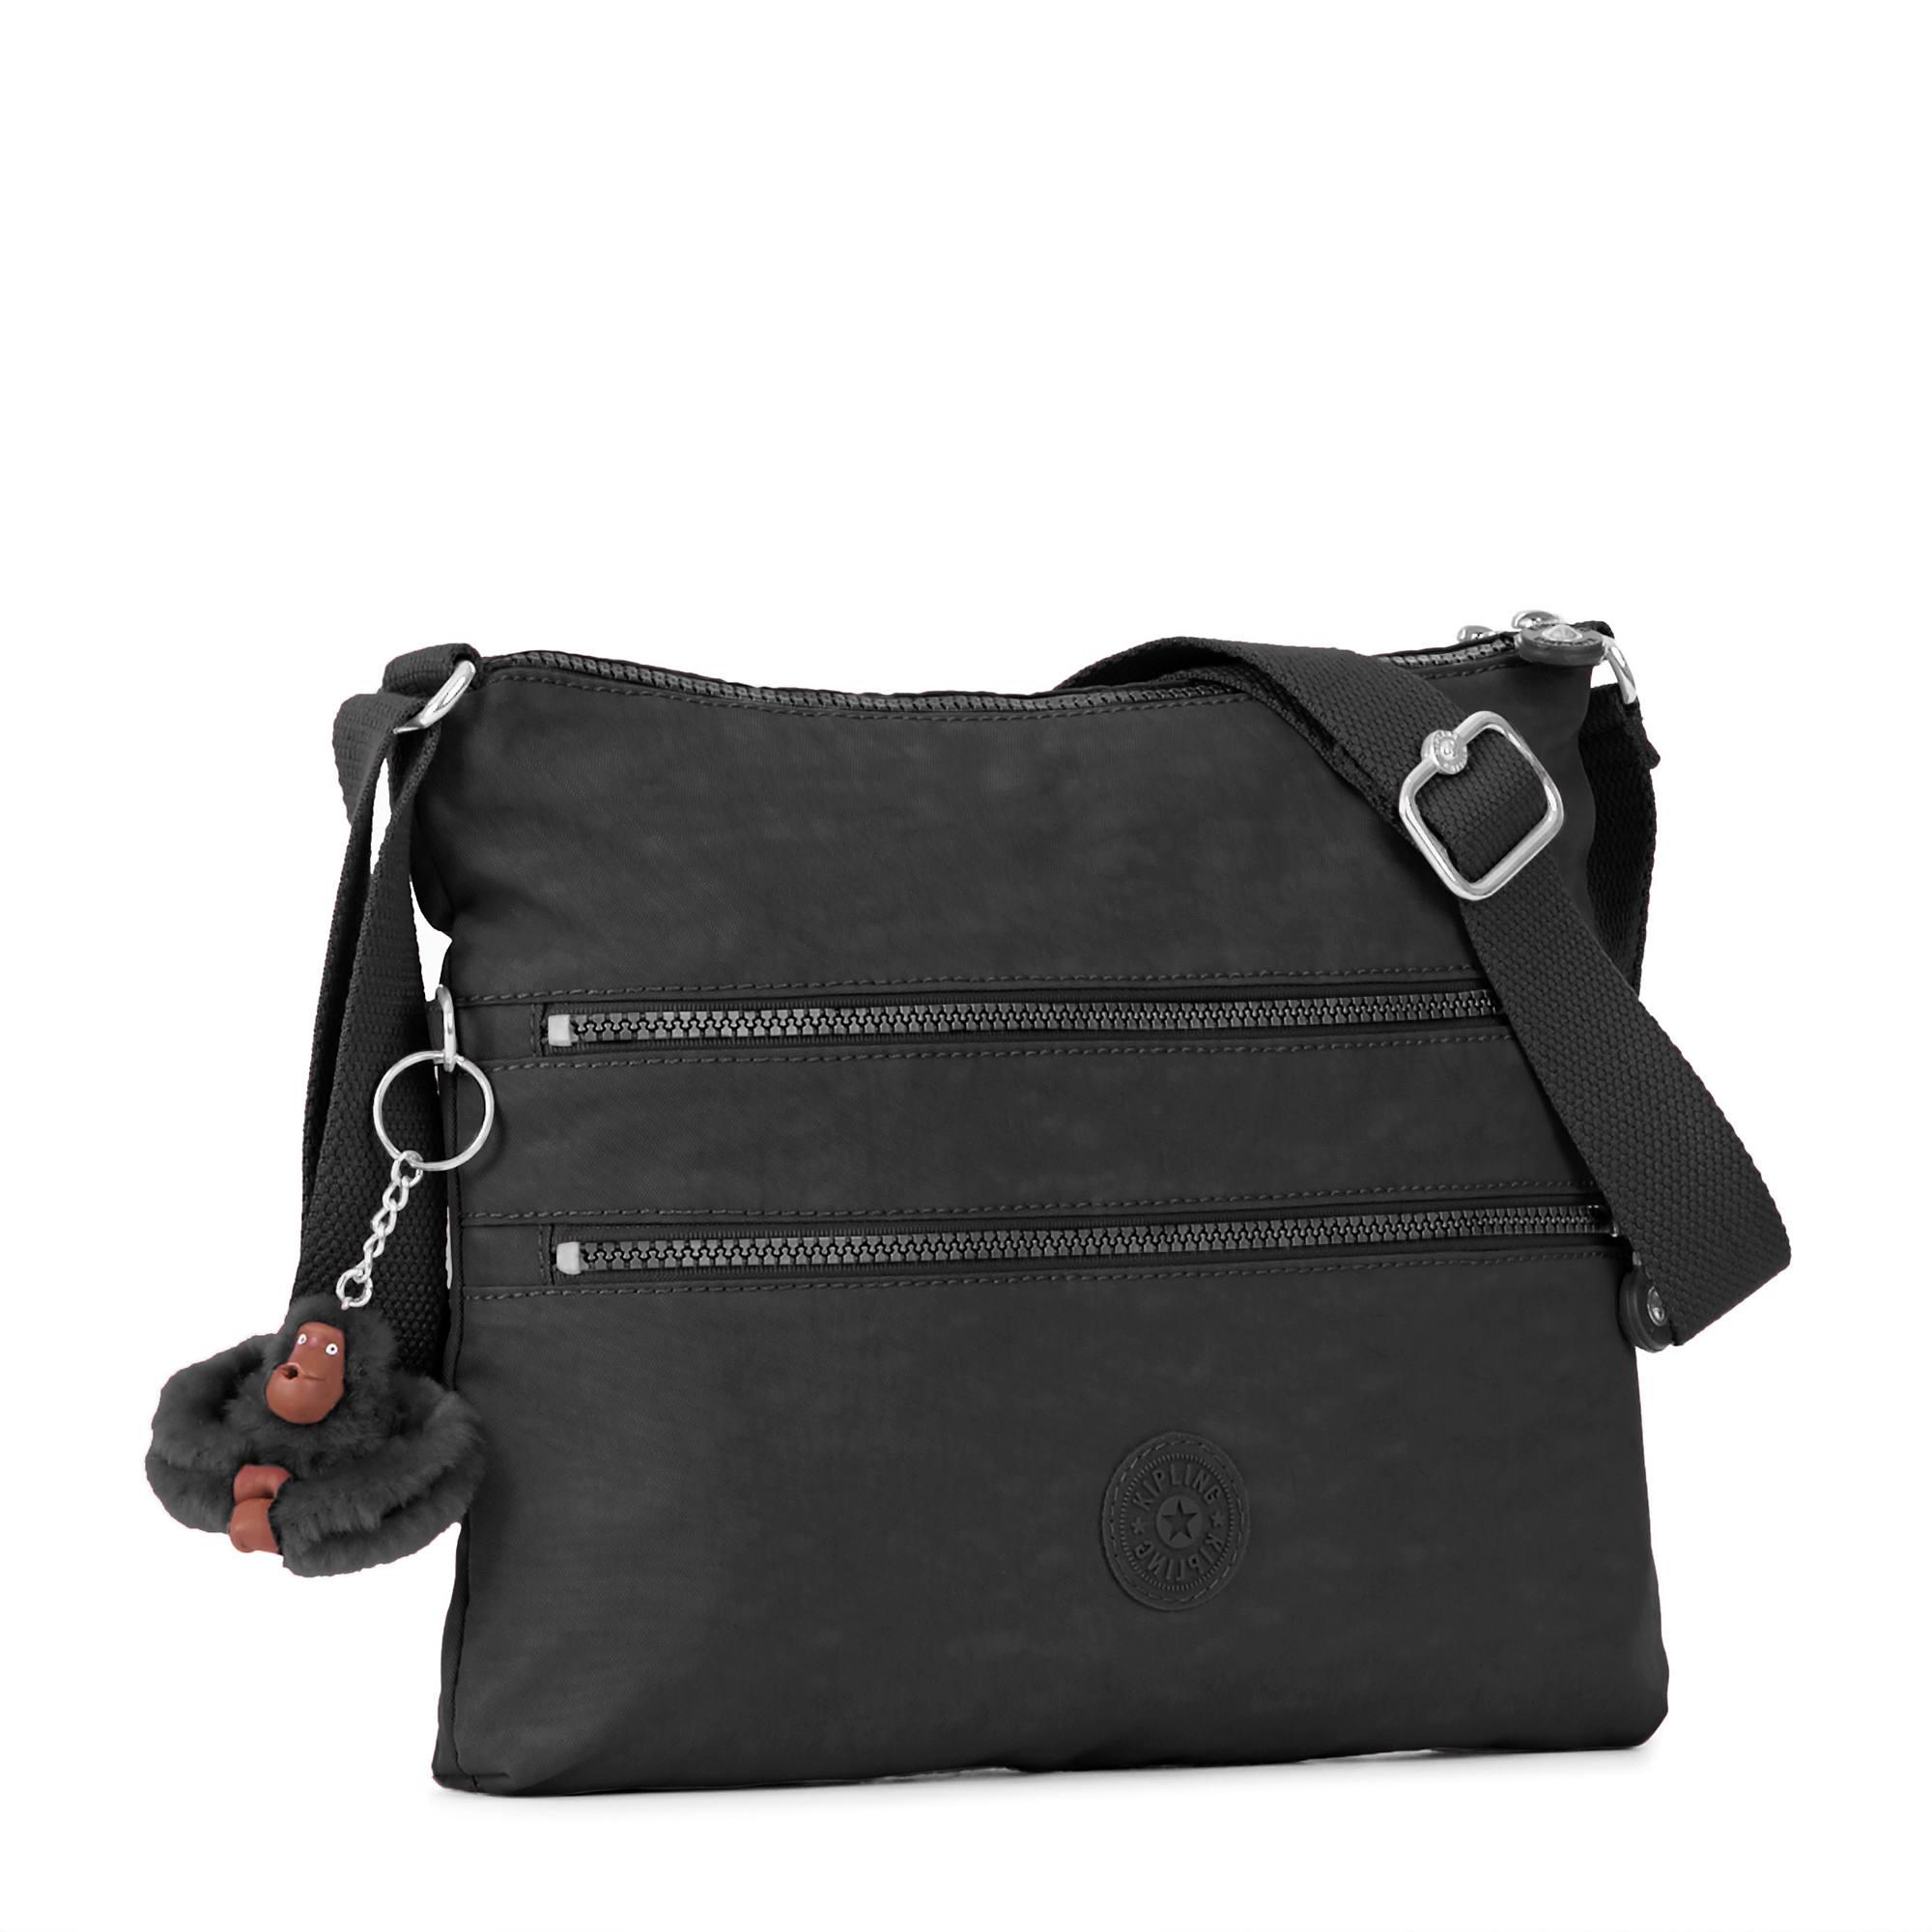 Kipling-Alvar-Metallic-Crossbody-Bag miniature 8